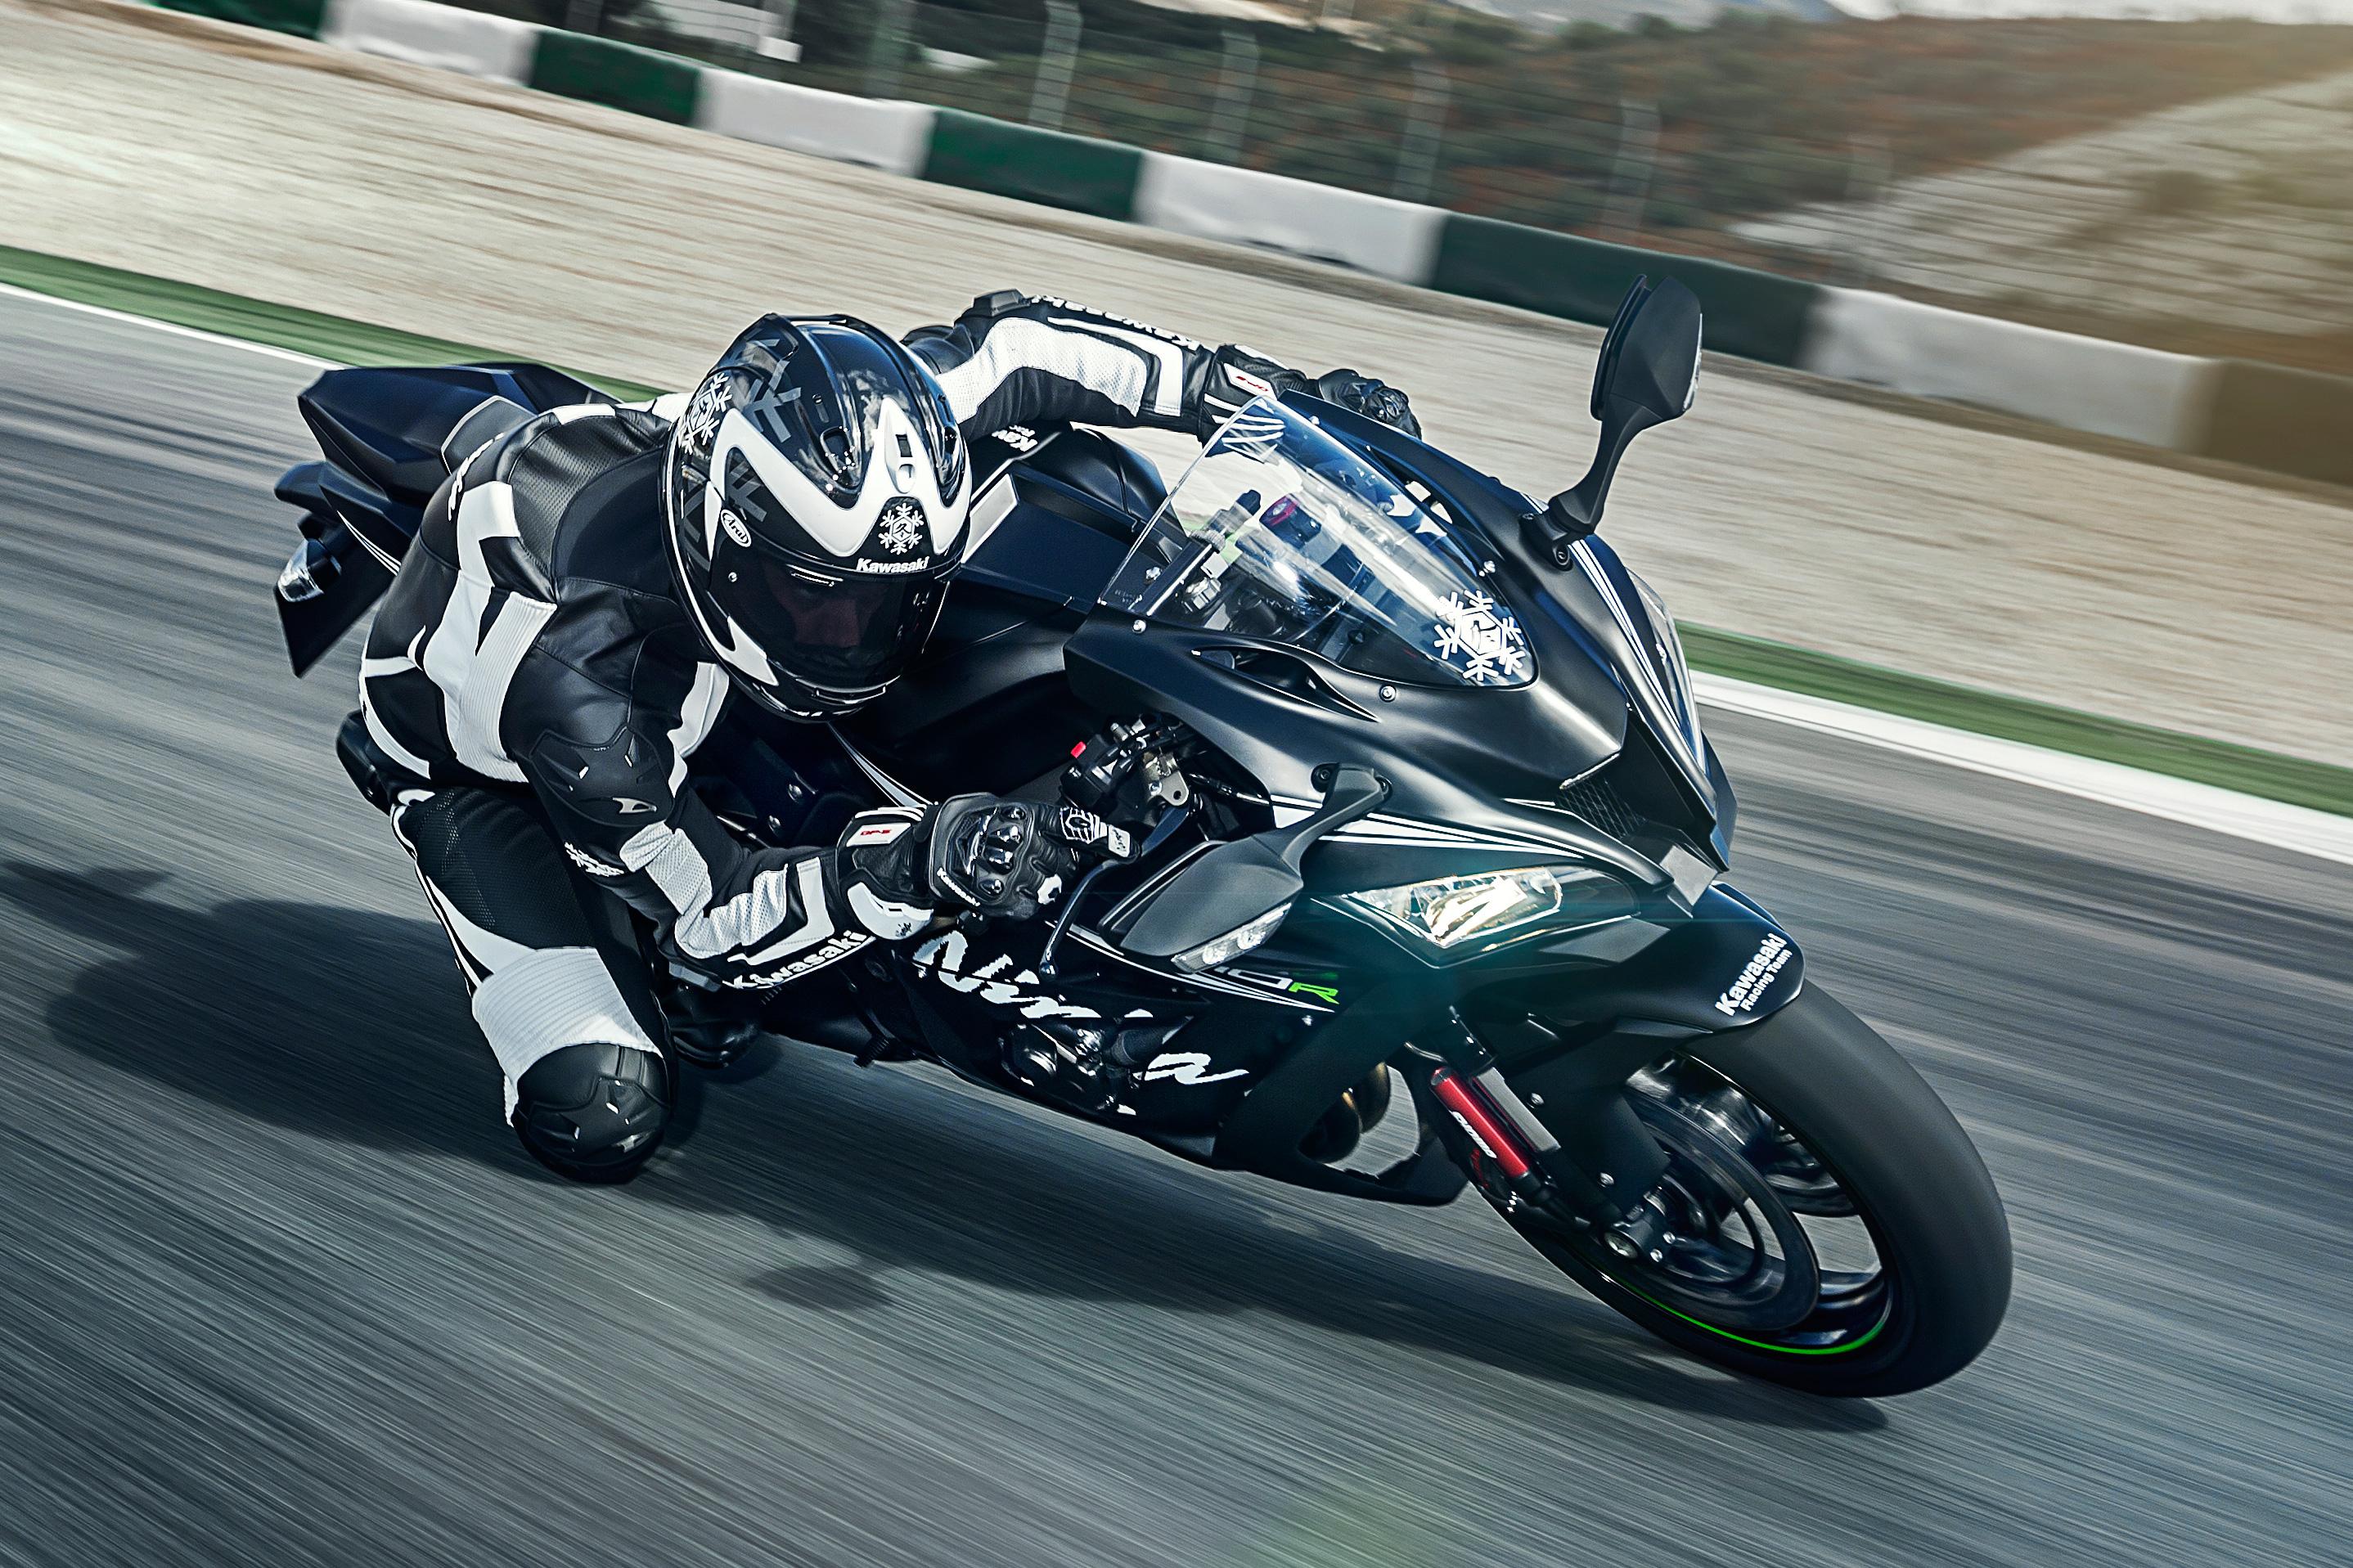 Kawasaki unveils 2016 road range at Eicma